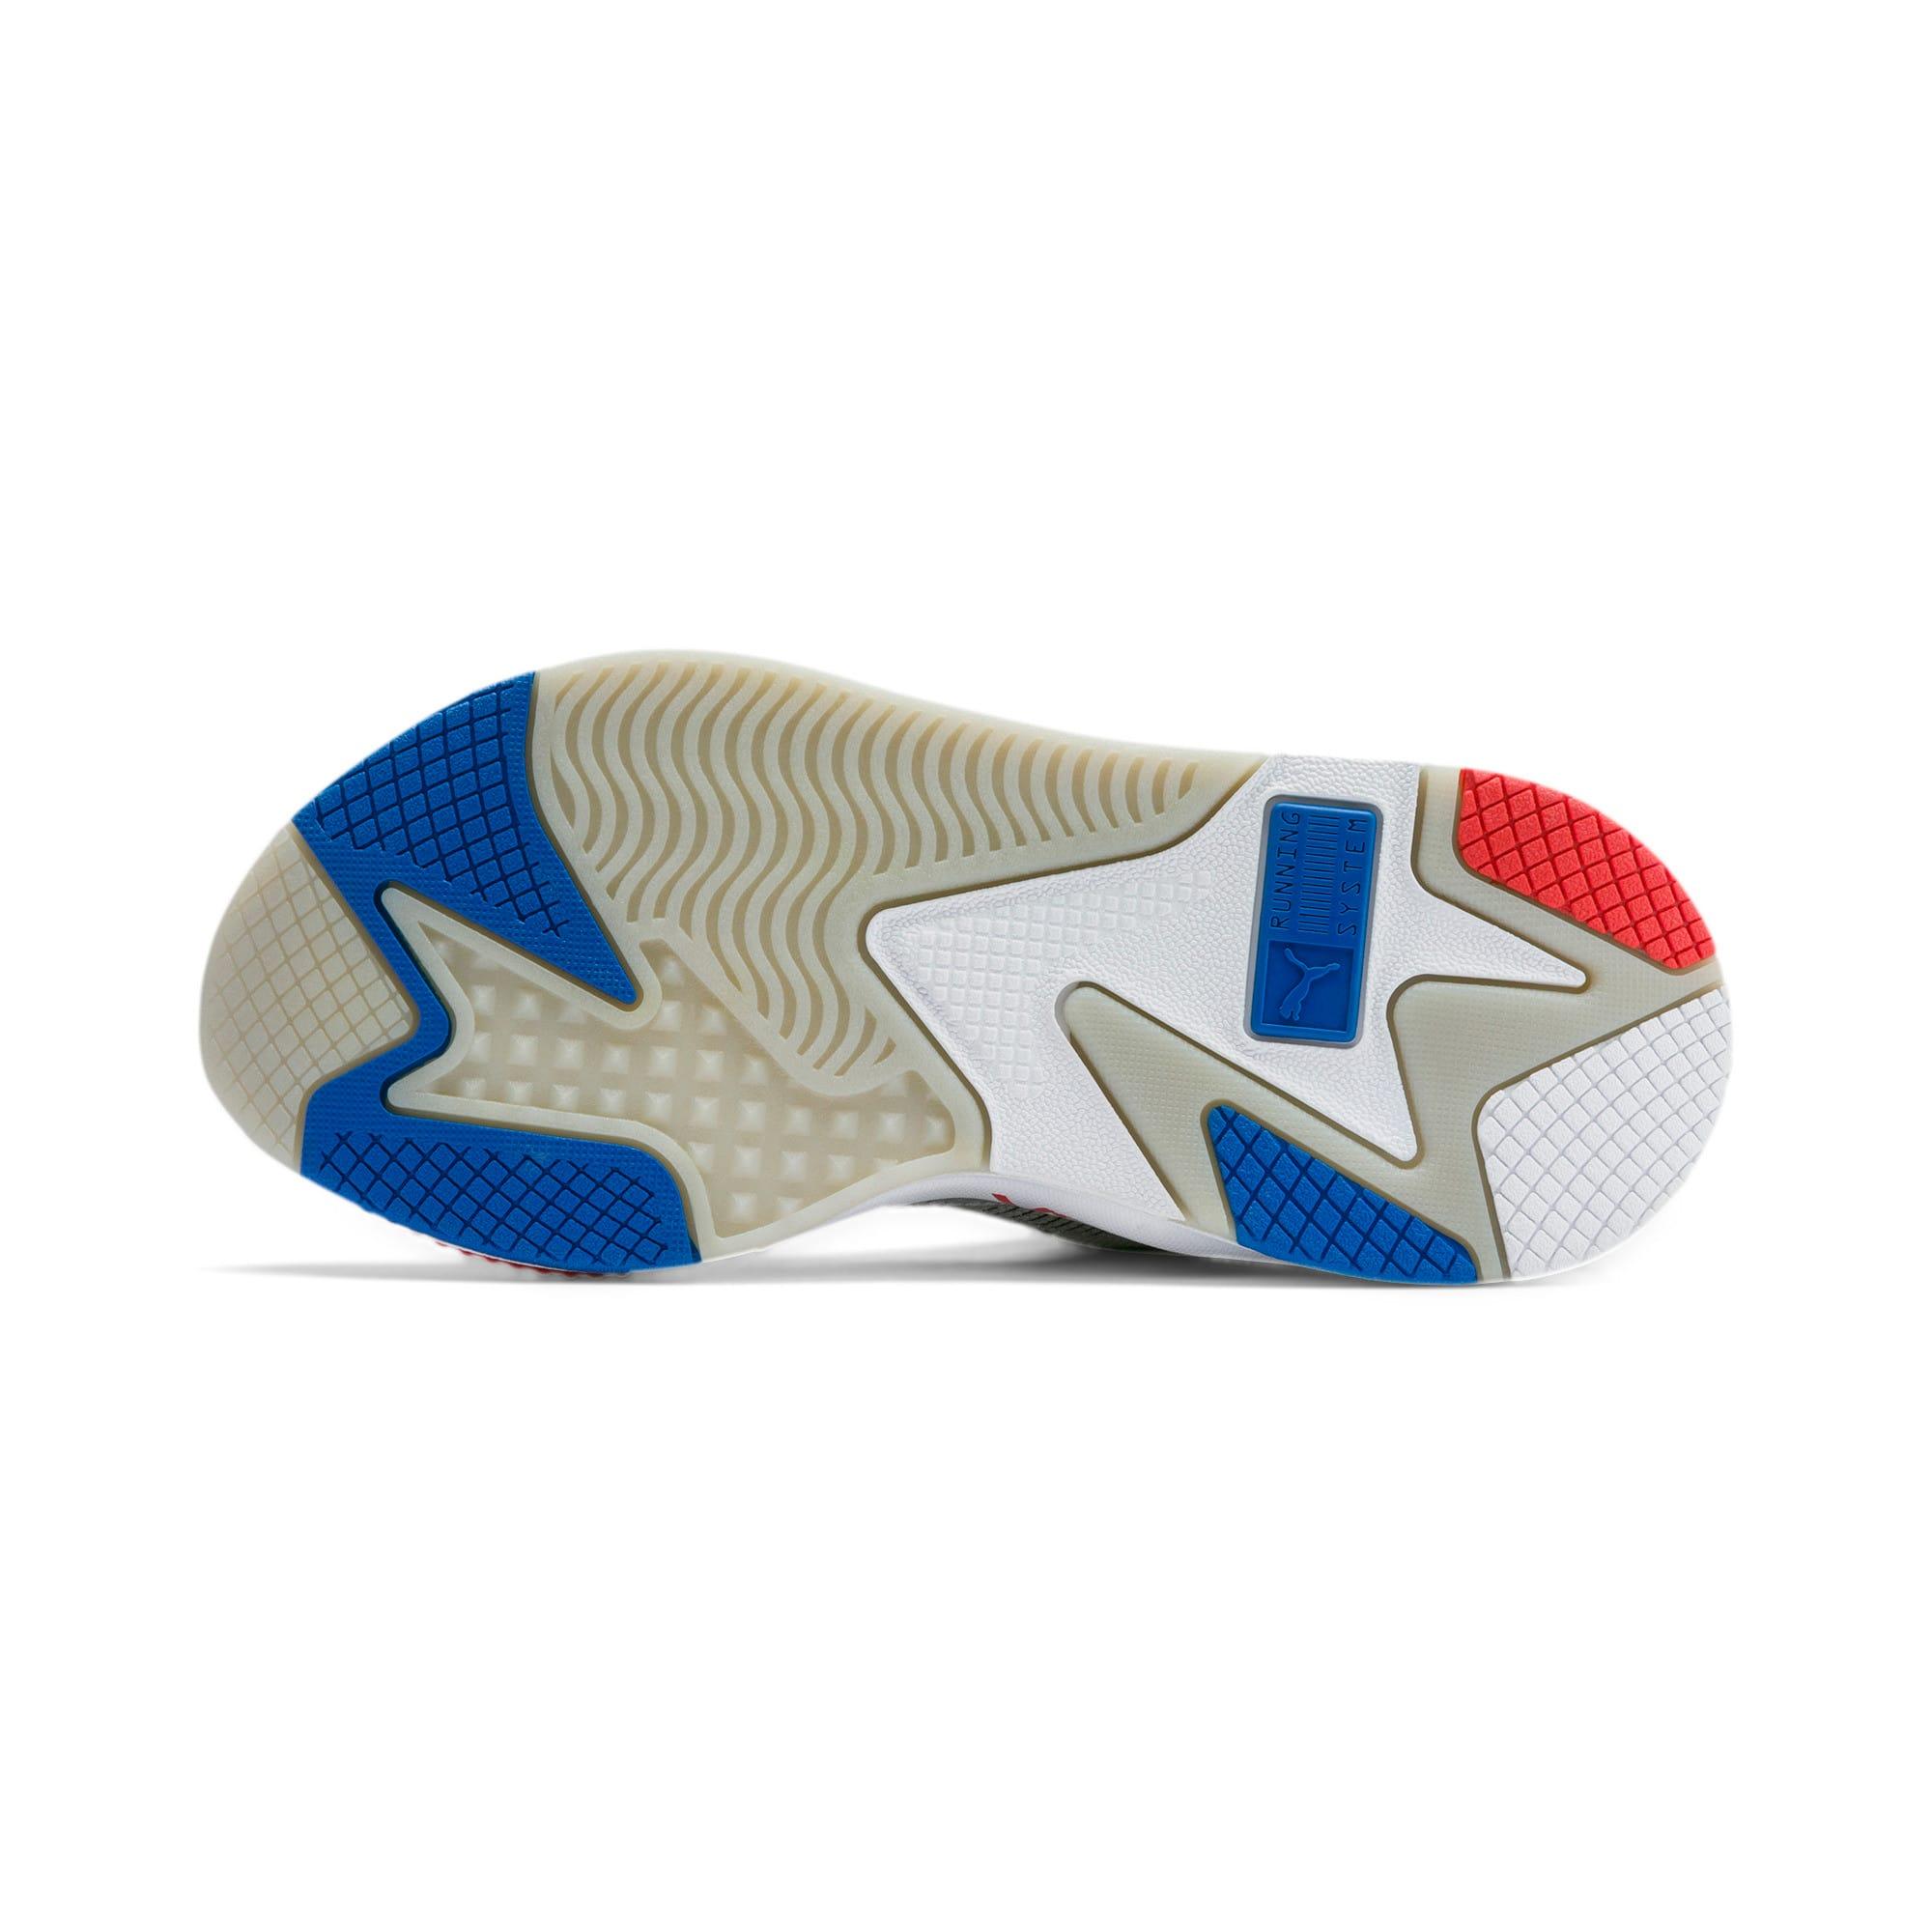 Thumbnail 4 of RS-X Space Agency Sneakers JR, Puma Silver-Gray Violet, medium